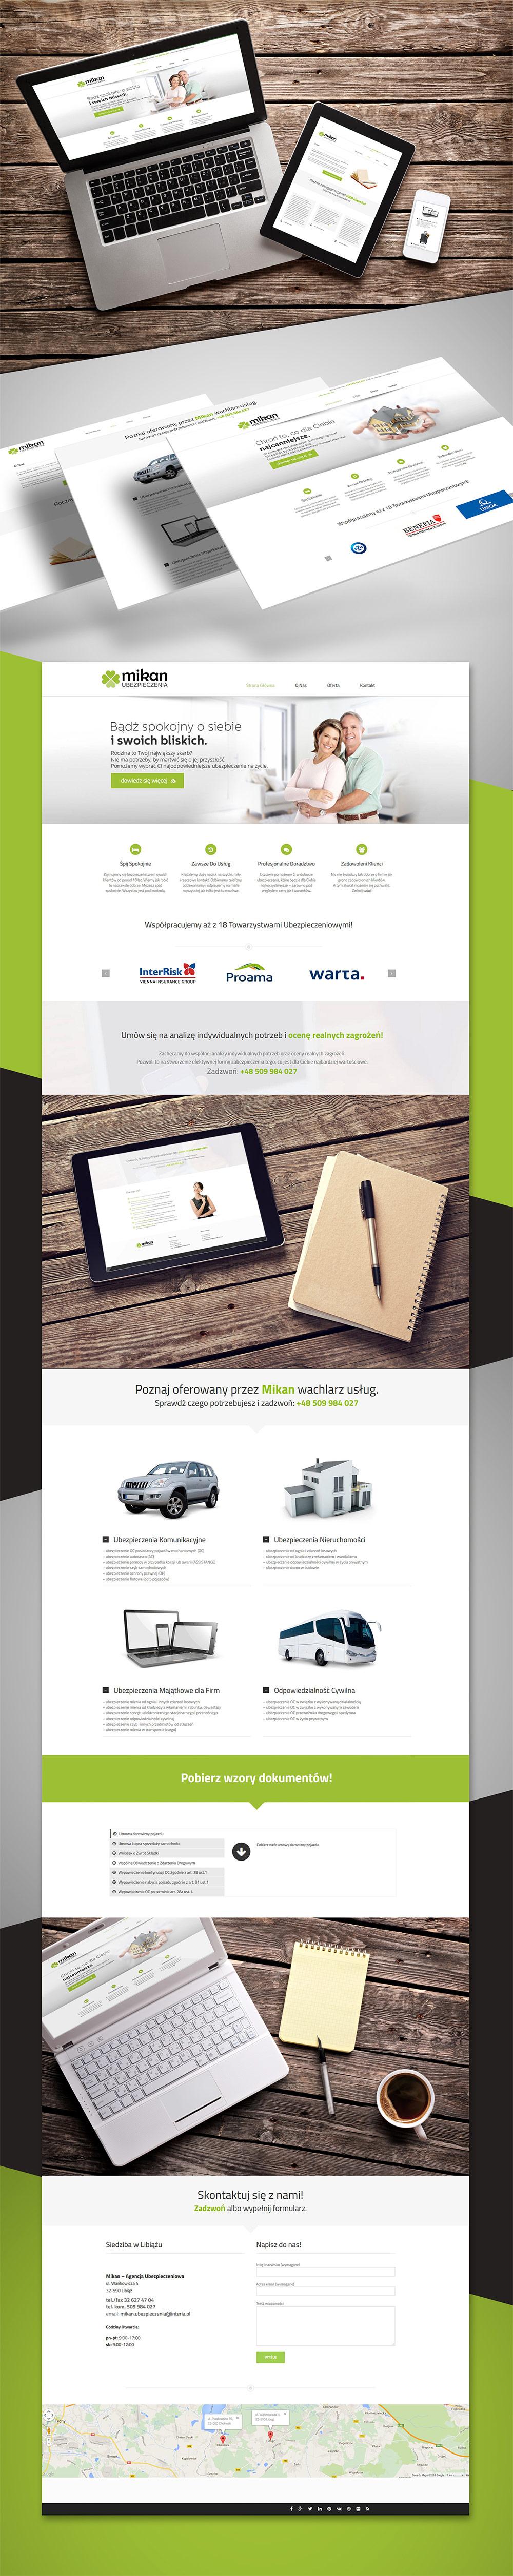 webdesign_mikan